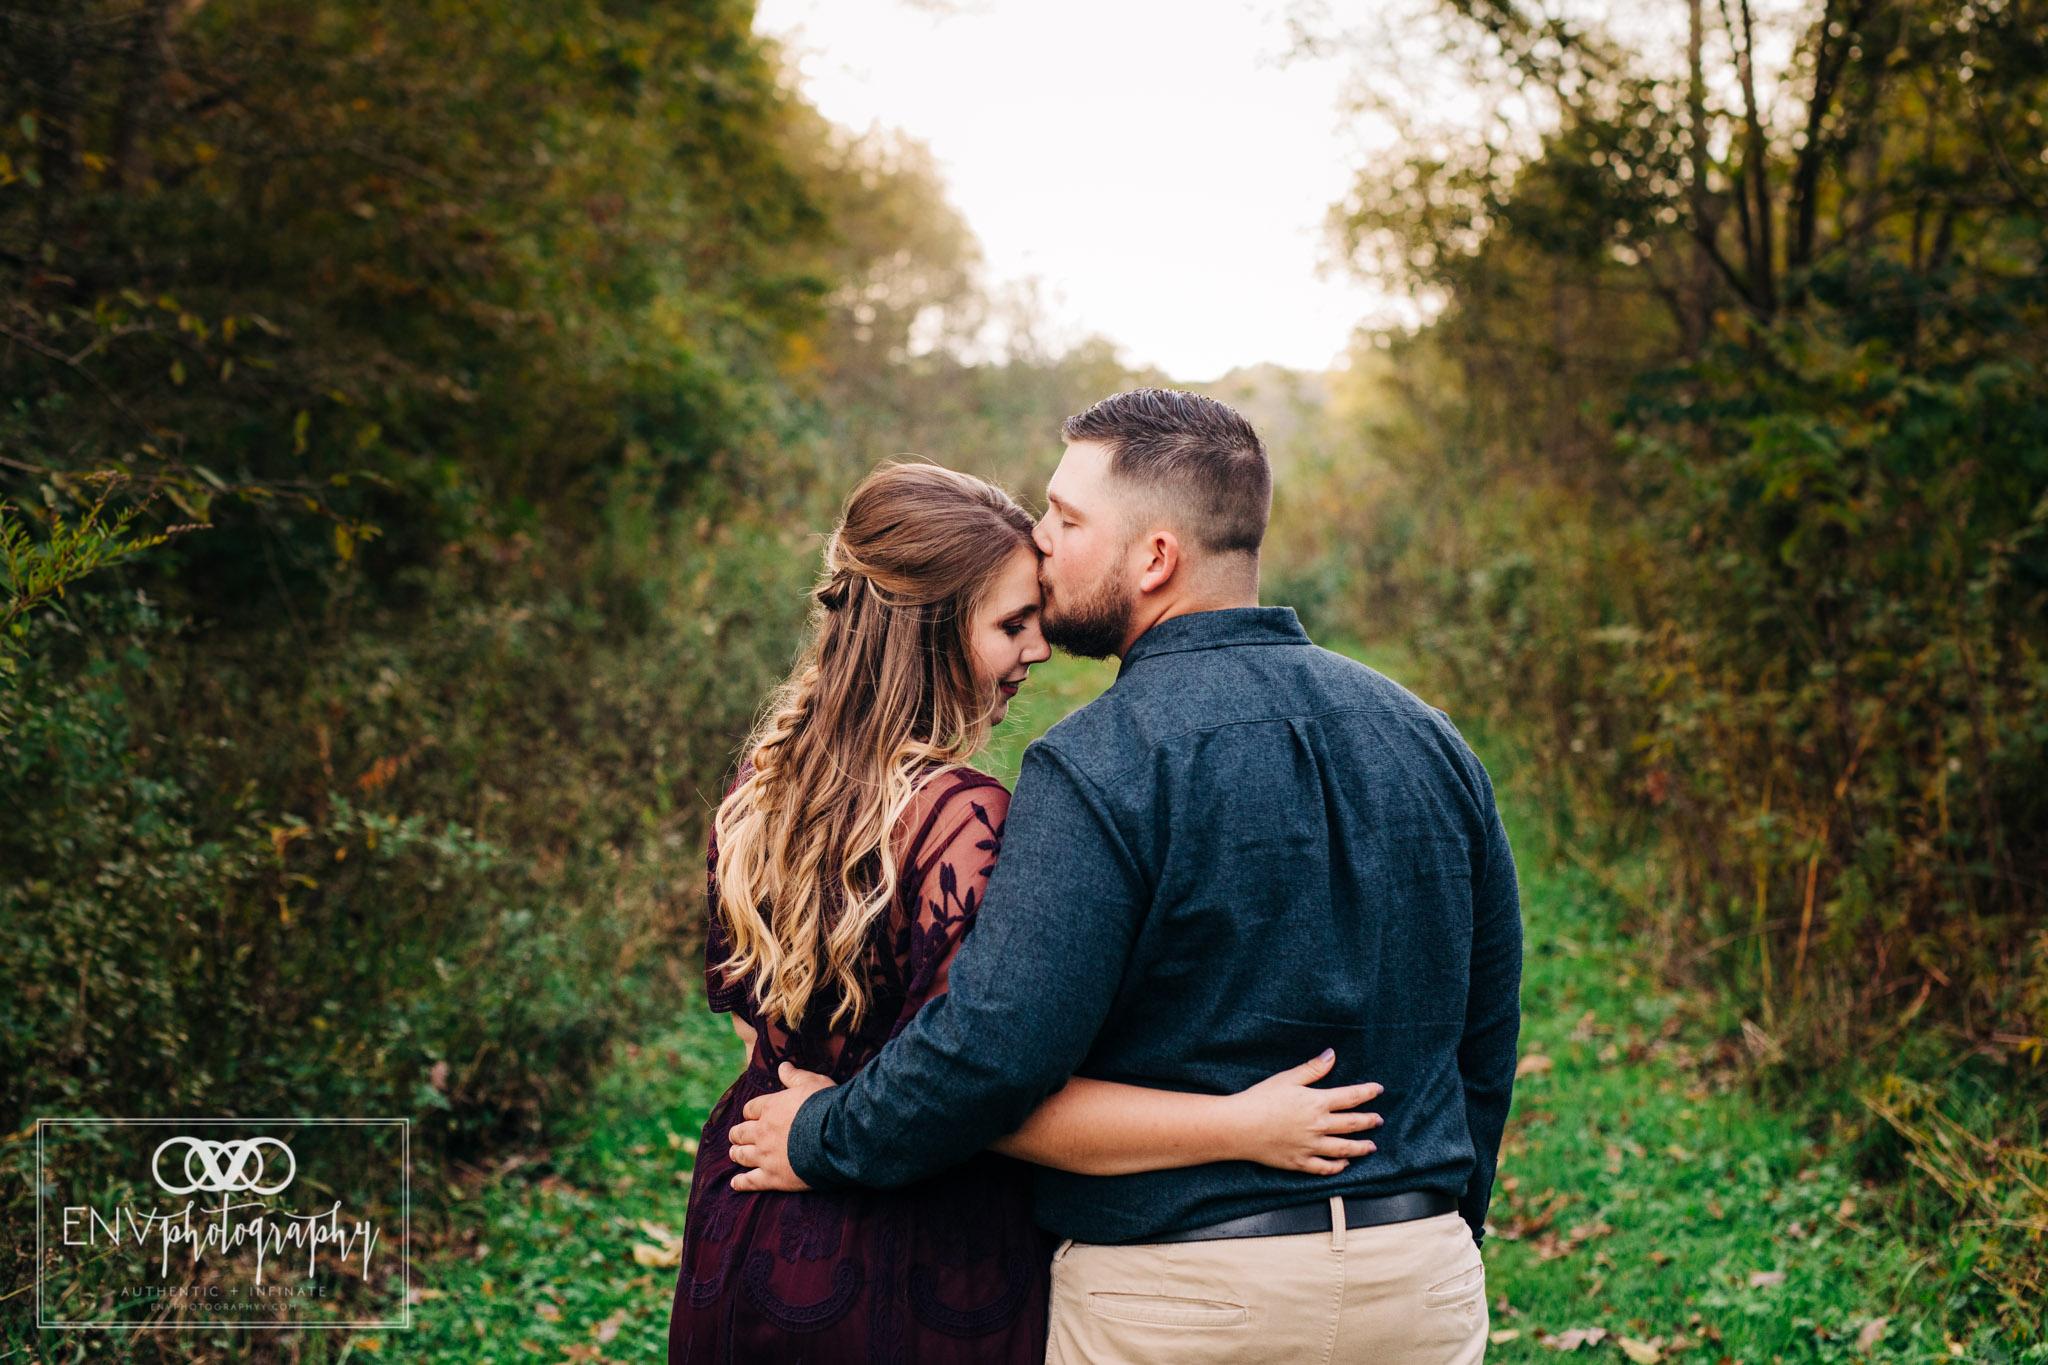 columbus ohio mount vernon ohio engagement photographer 2018 (6).jpg